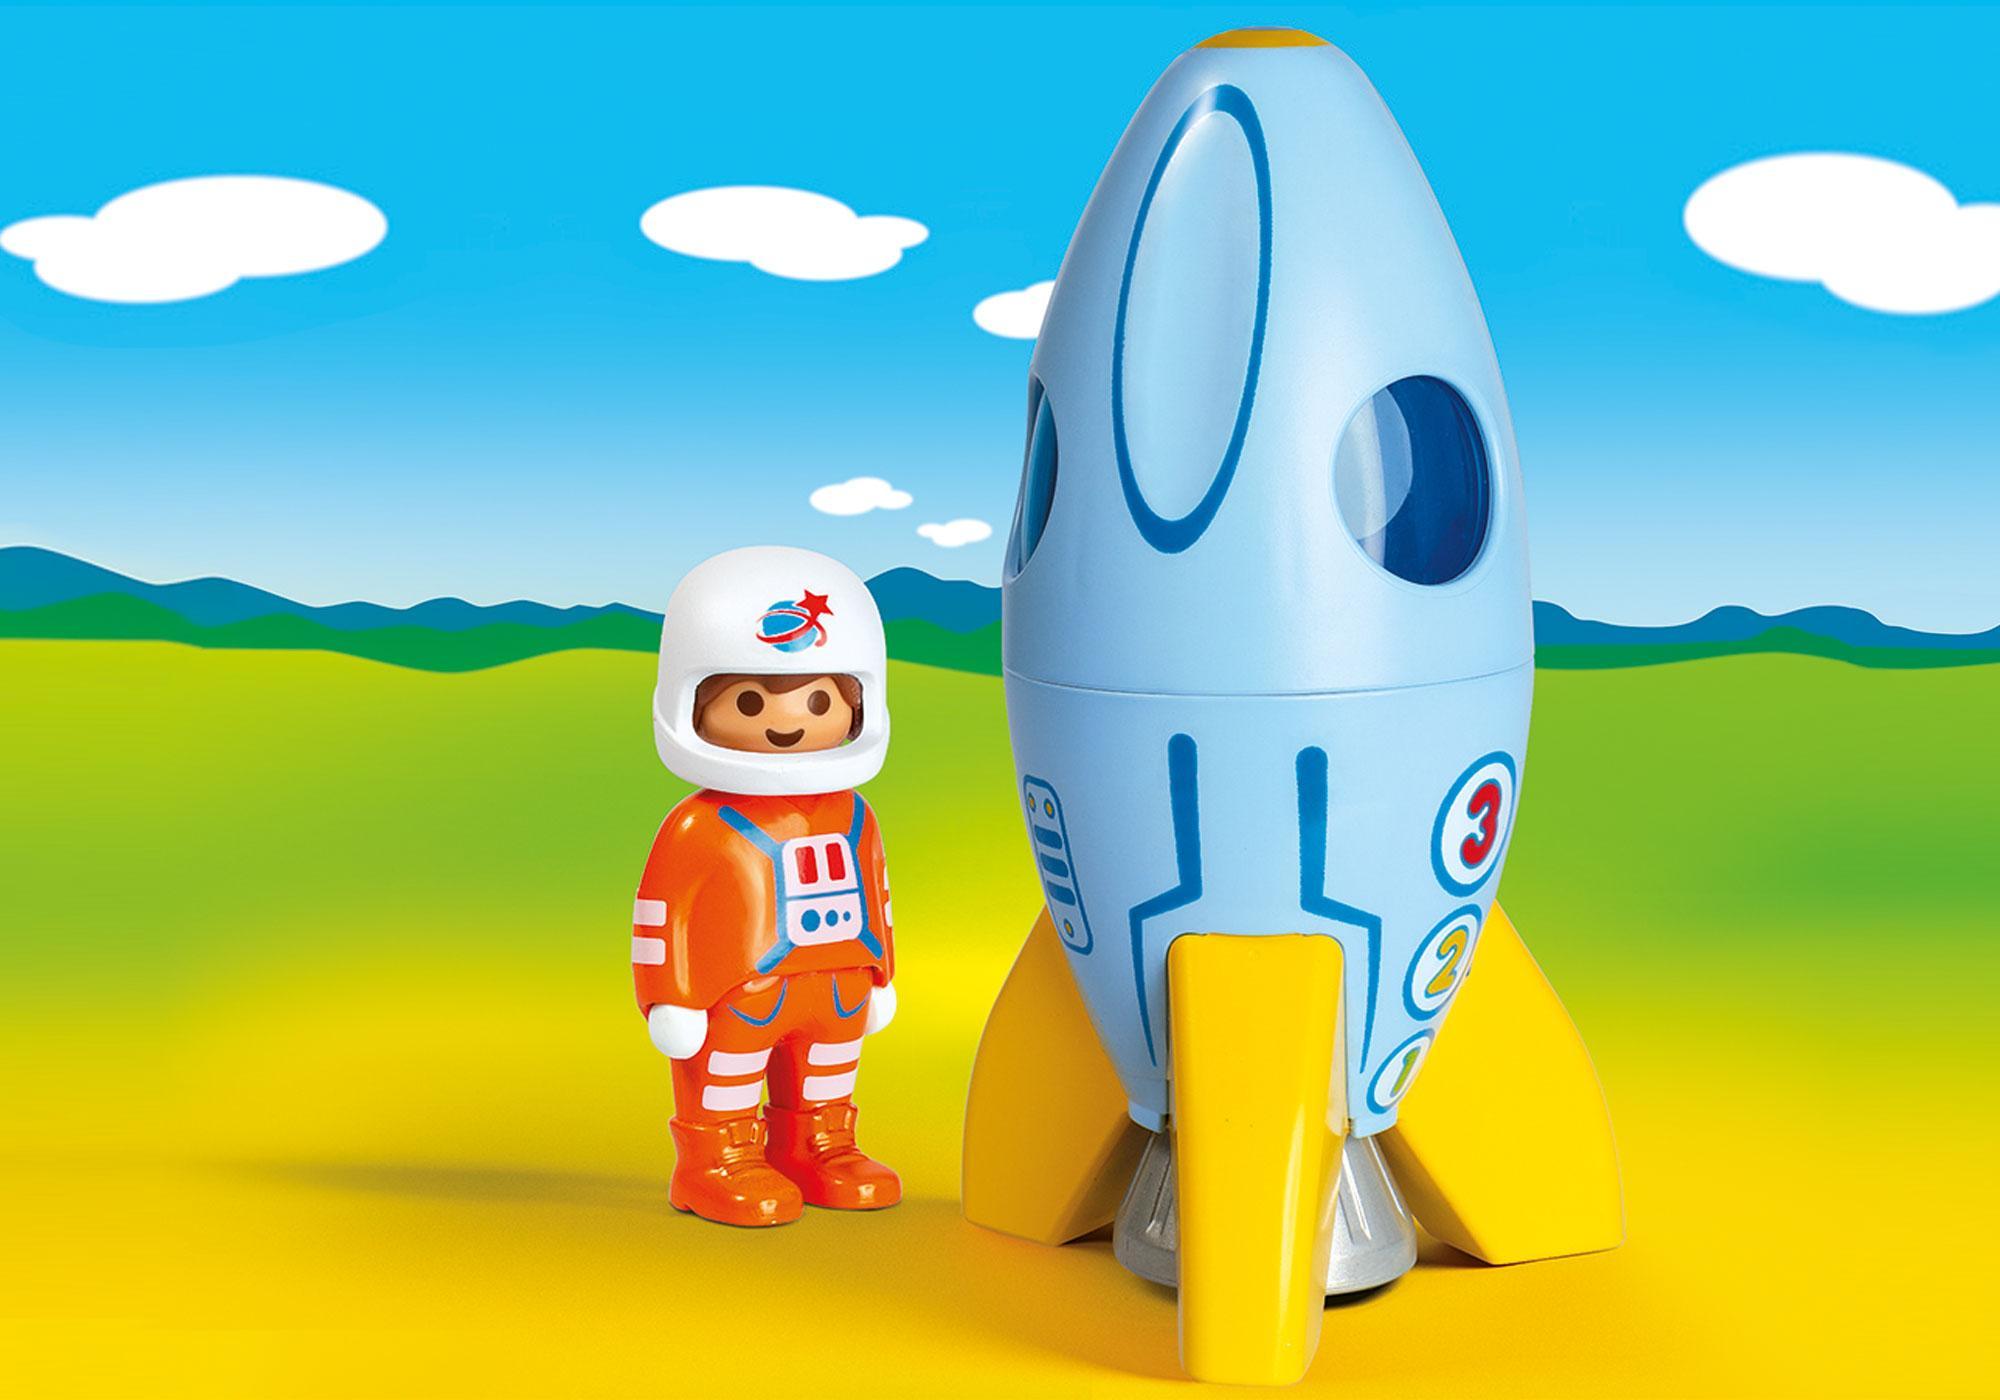 70186_product_detail/Razzo con astronauta 1.2.3